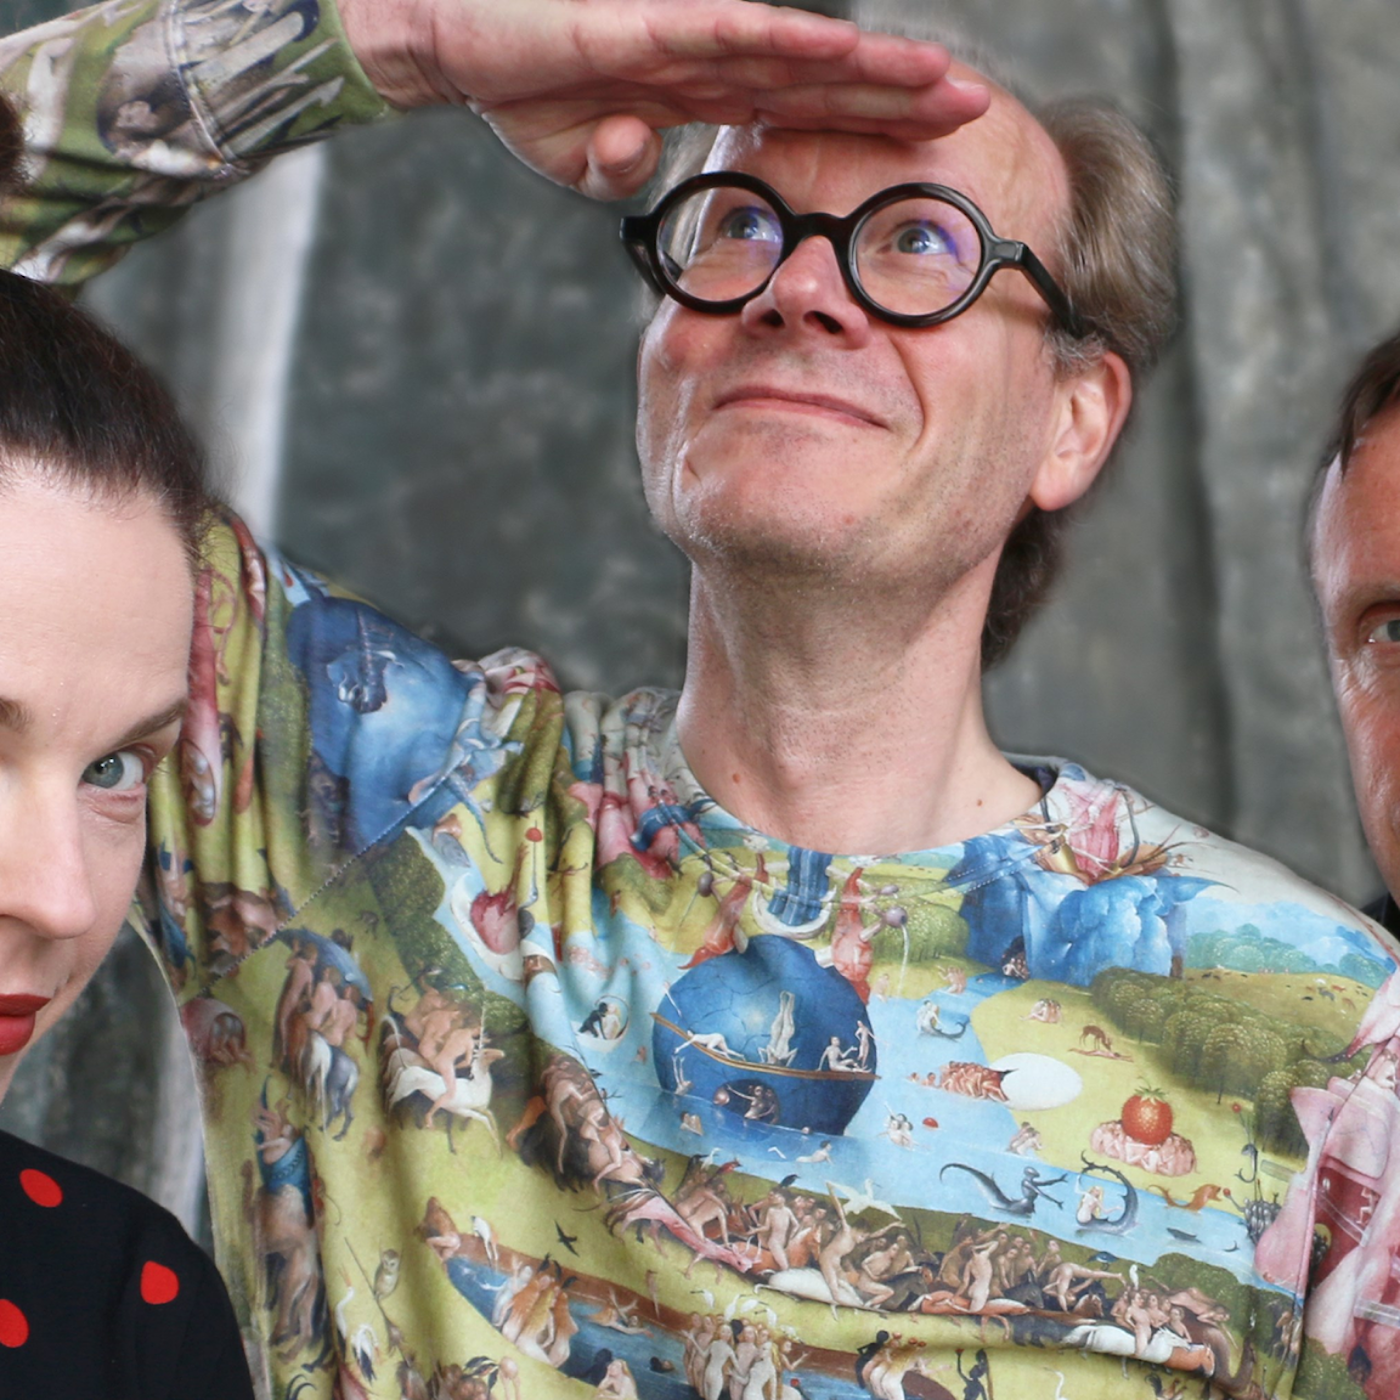 Johan Hakelius, Jessika Gedin och Göran Everdahl